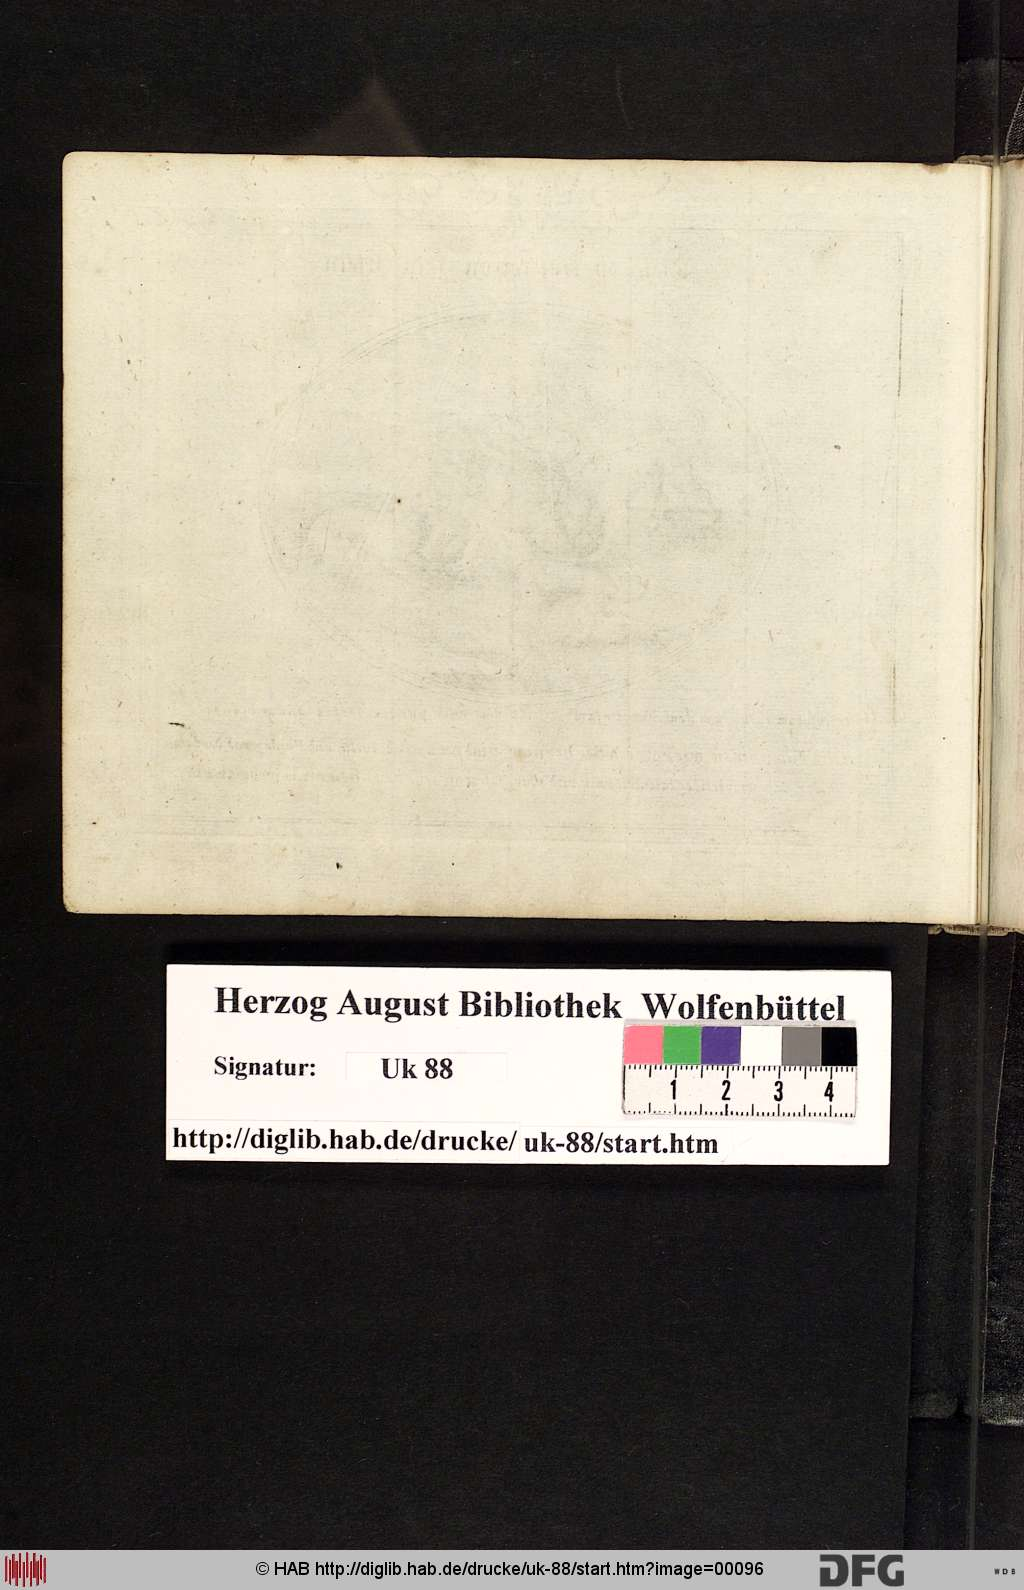 http://diglib.hab.de/drucke/uk-88/00096.jpg